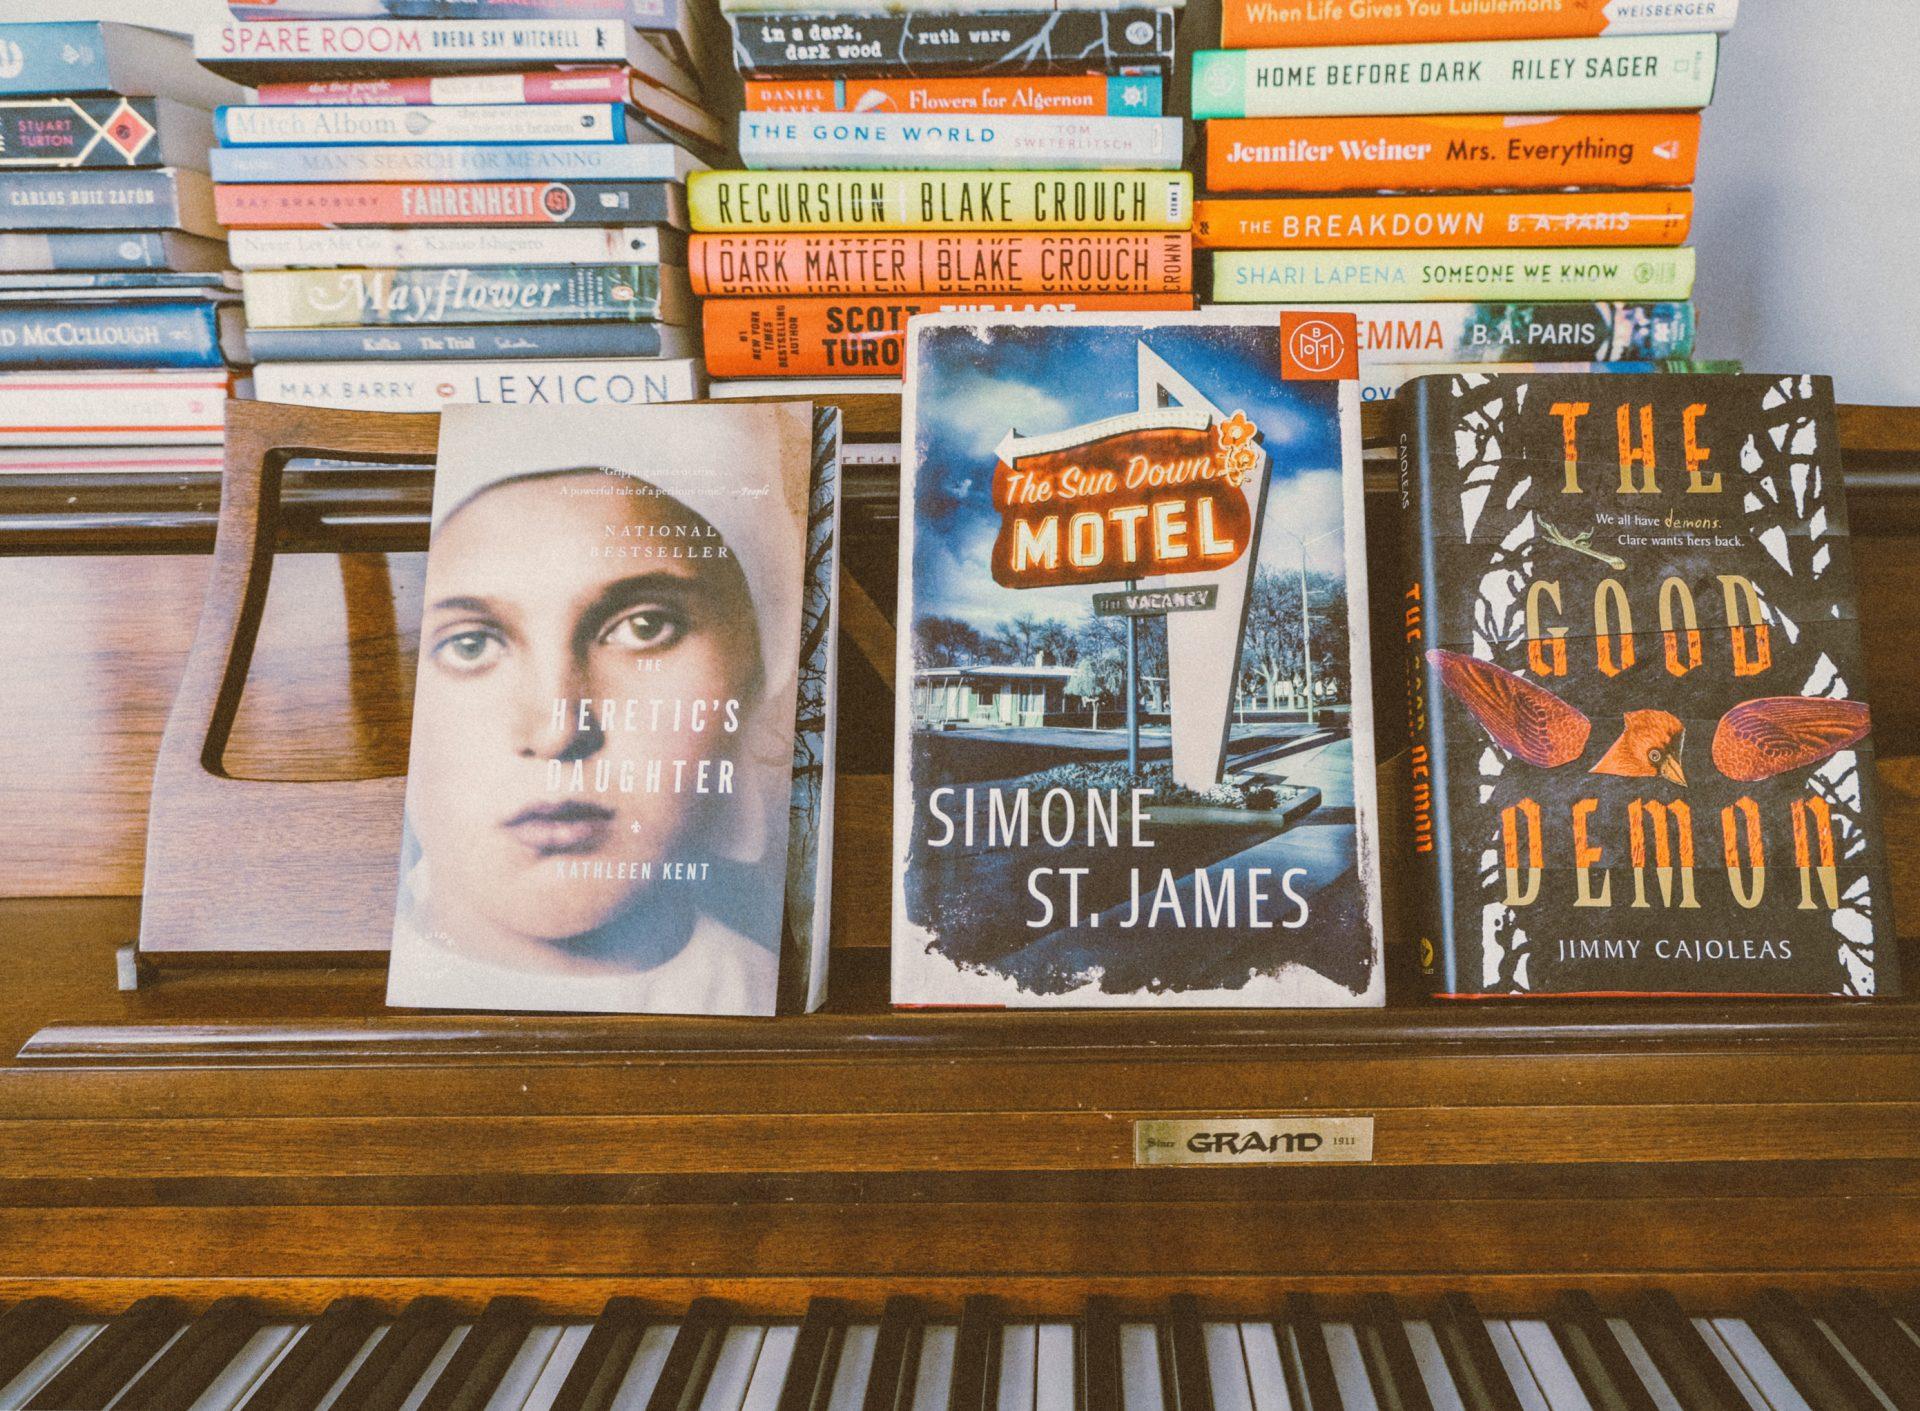 book club, October book club, the good demon, heretics daughter, sundown motel, halloween, spooky reads, book club for fun, free book club